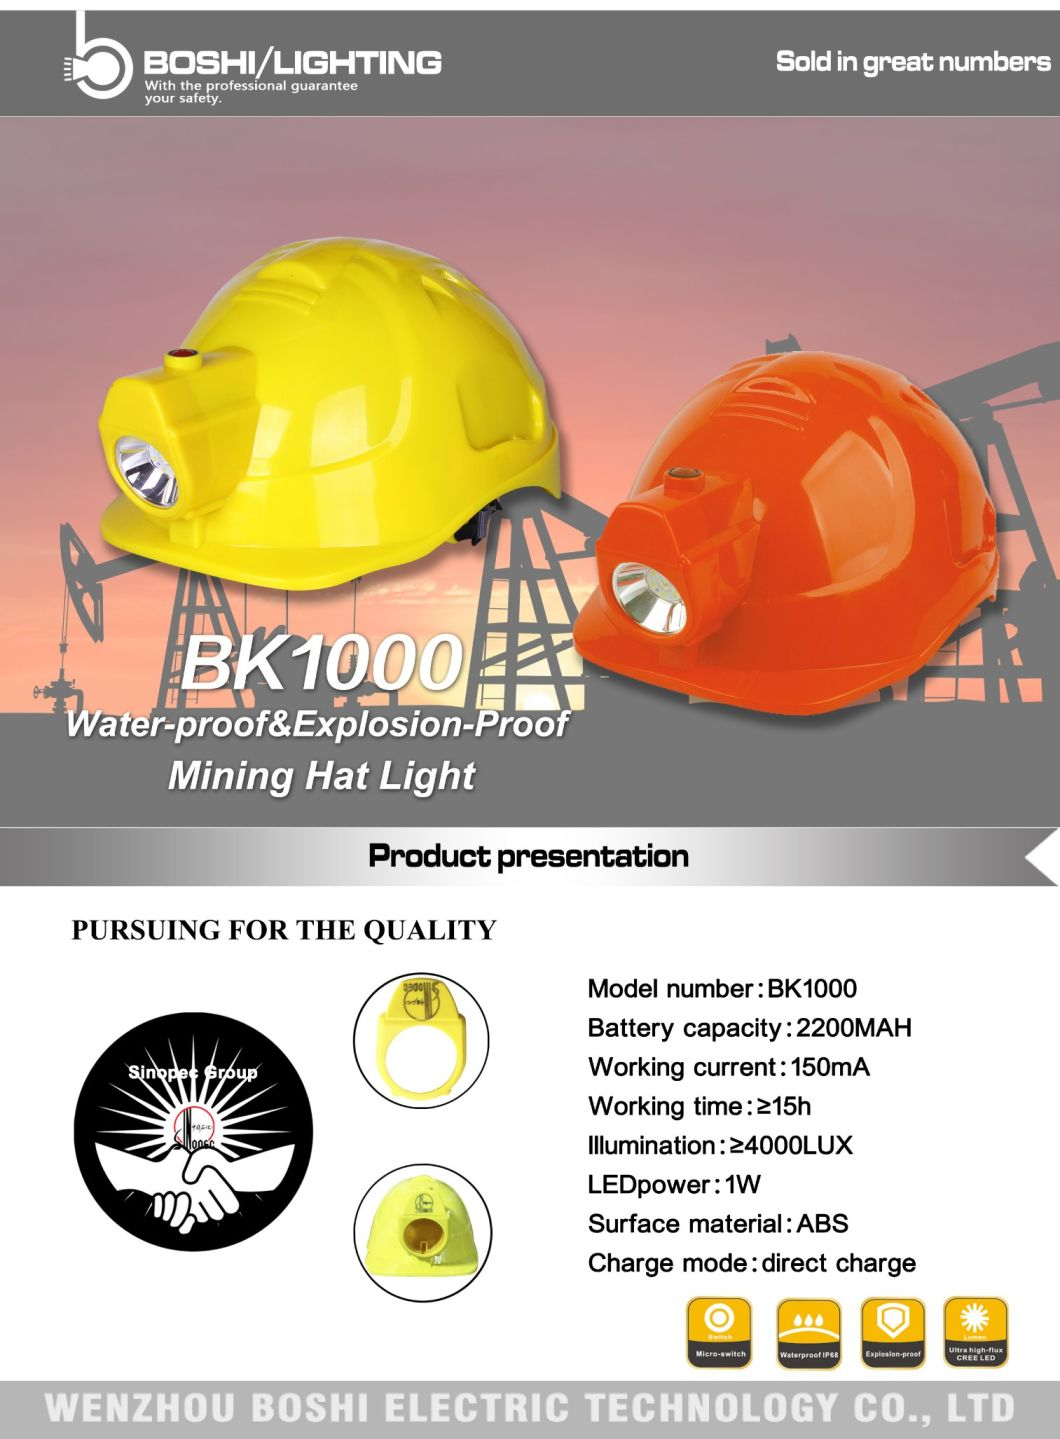 1W LED Cordless Cap Lamp, Mine Lamp, Miner Lamp (BK1000)